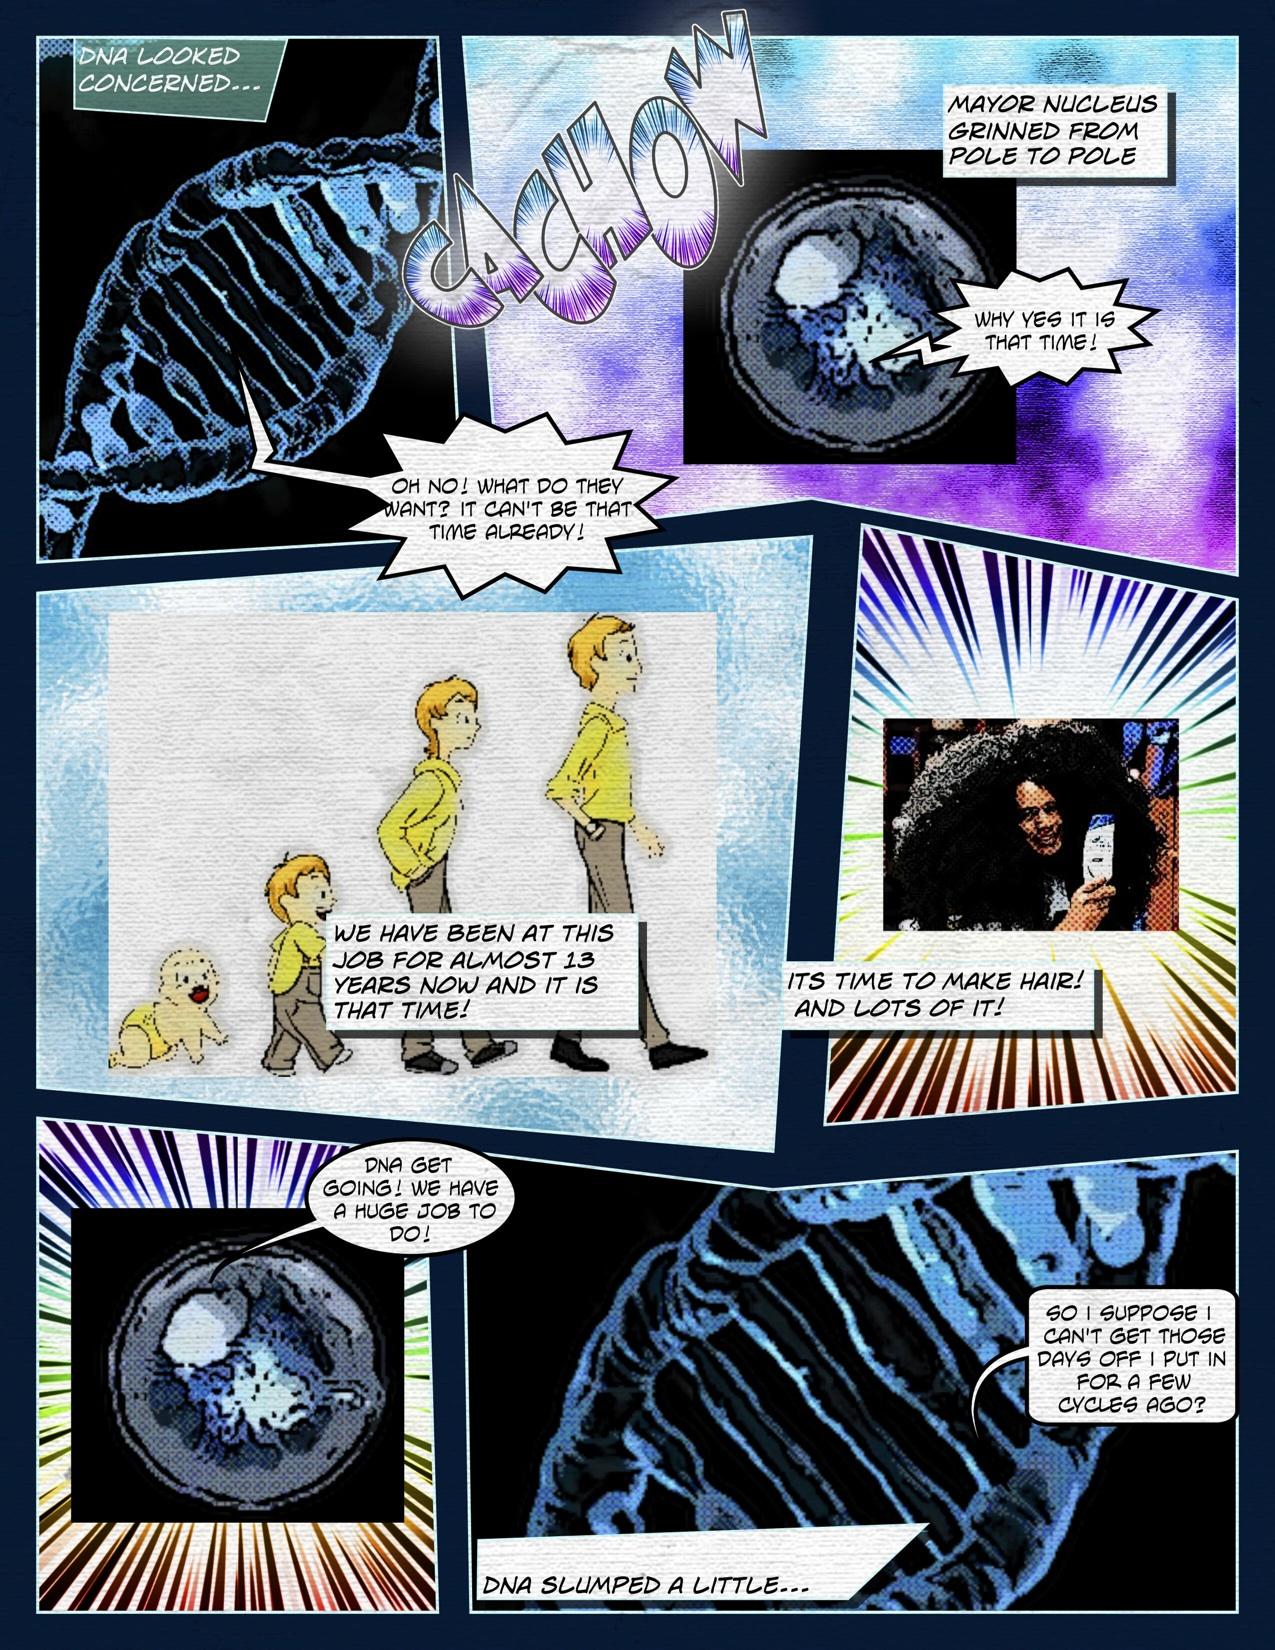 Making Sense Of DNA and RNA  plasqcom